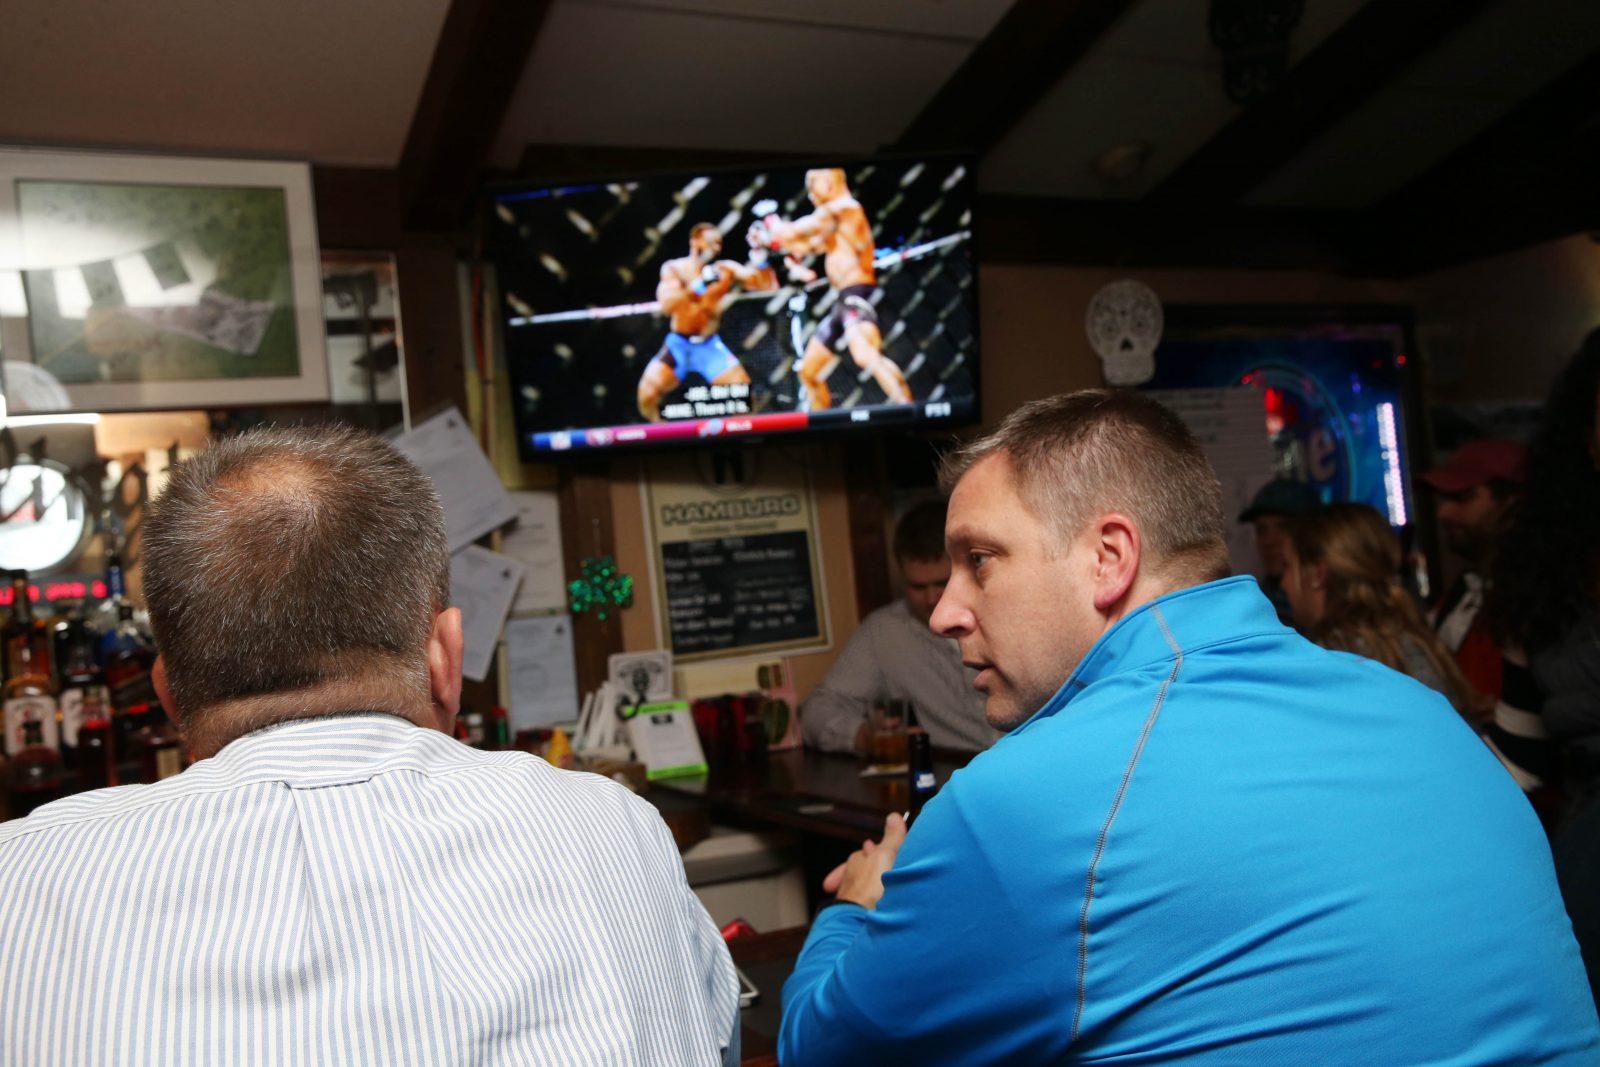 Karl Kozlowski, left, of Buffalo, and Andrew Ray, catch a boxing match on TV at the Wellington Pub.    (Sharon Cantillon/Buffalo News)